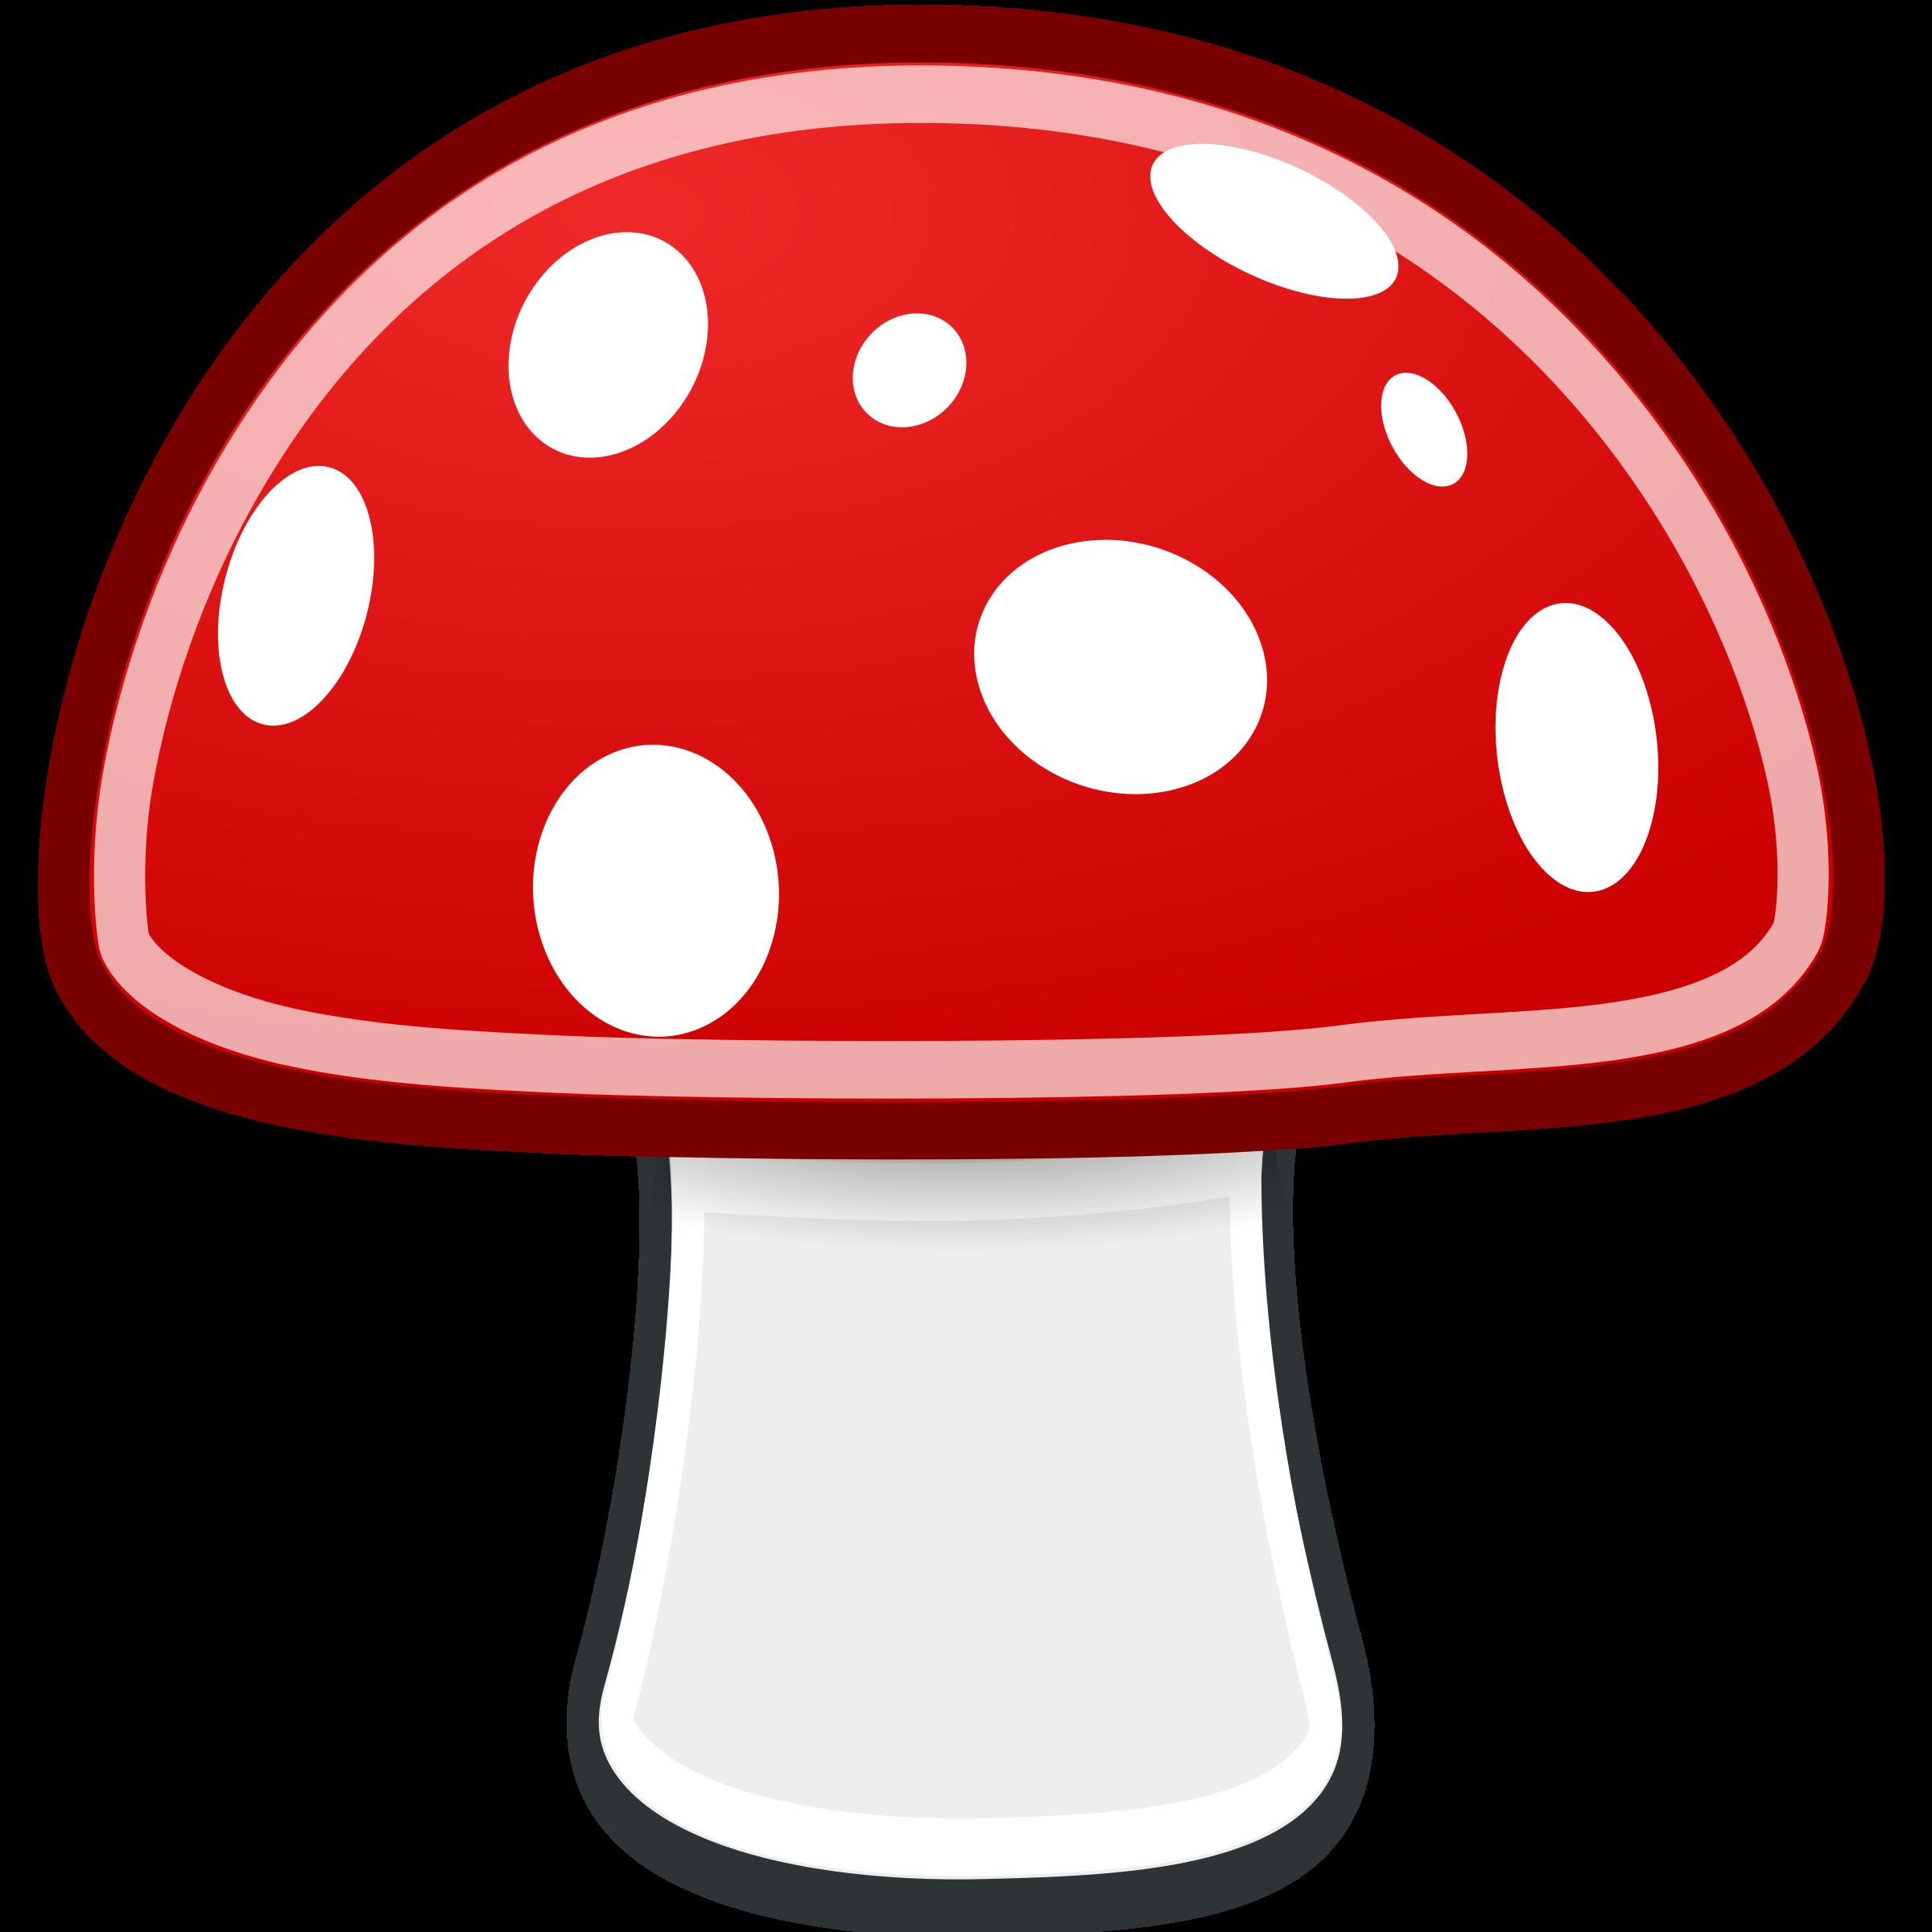 Tango Style Mushroom Mushroom clipart, Clip art, Stuffed